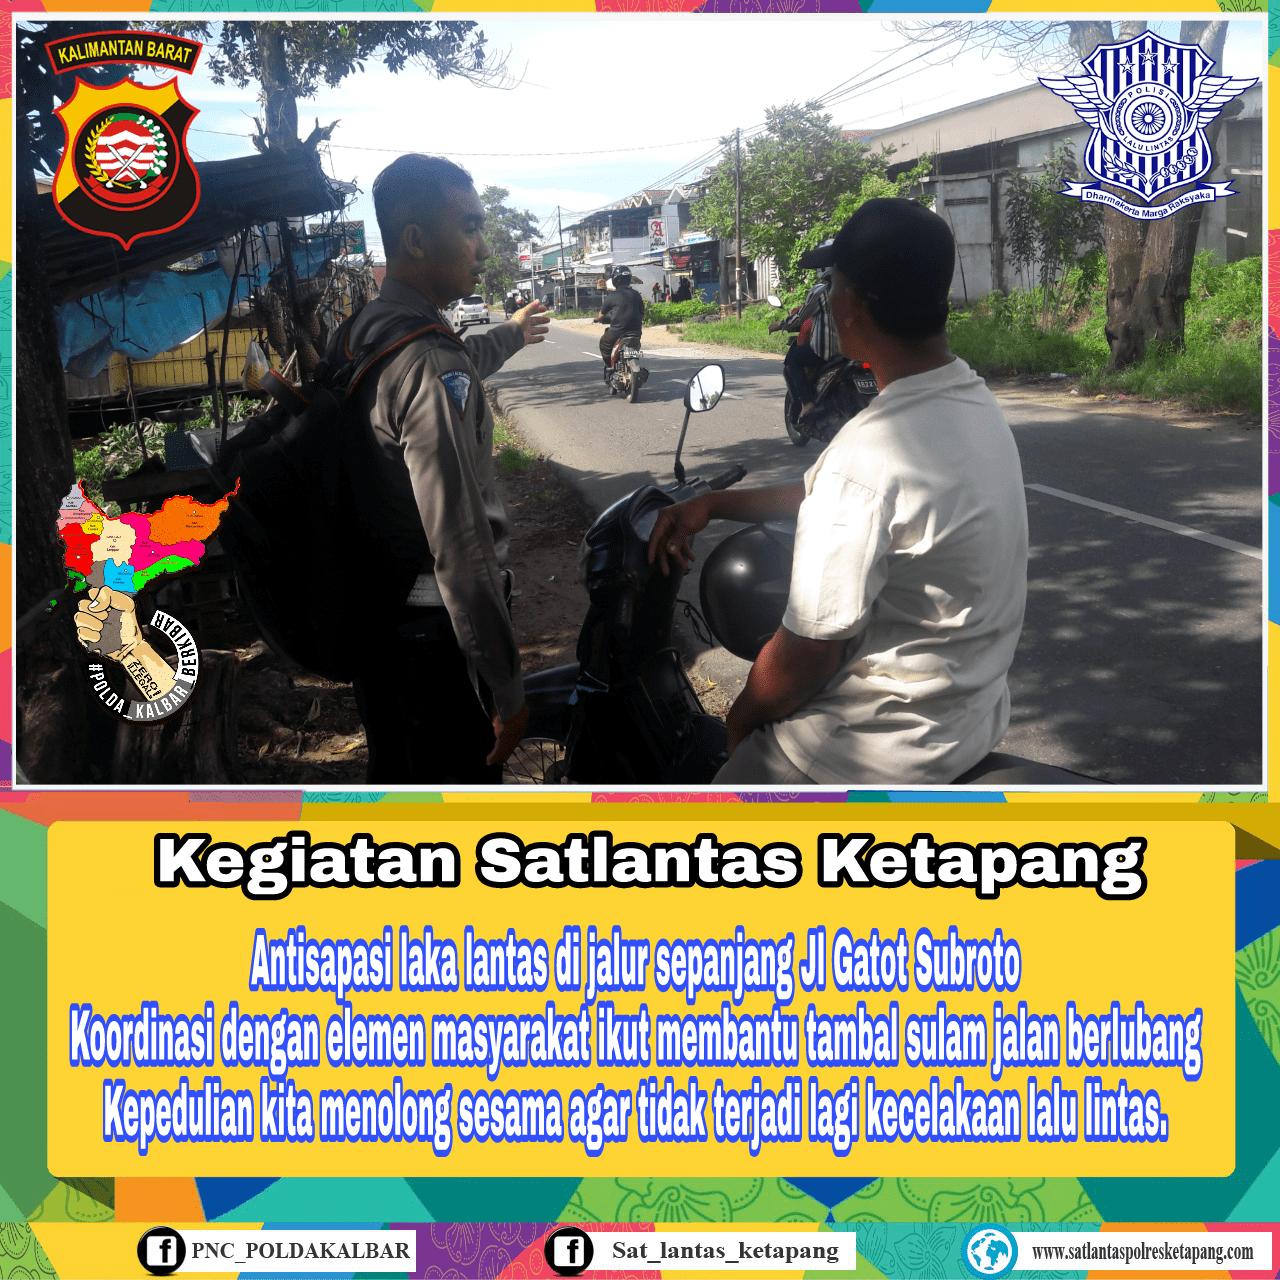 Waspada Jalan Gatot Subroto rawan kecelakaan lalu lintas